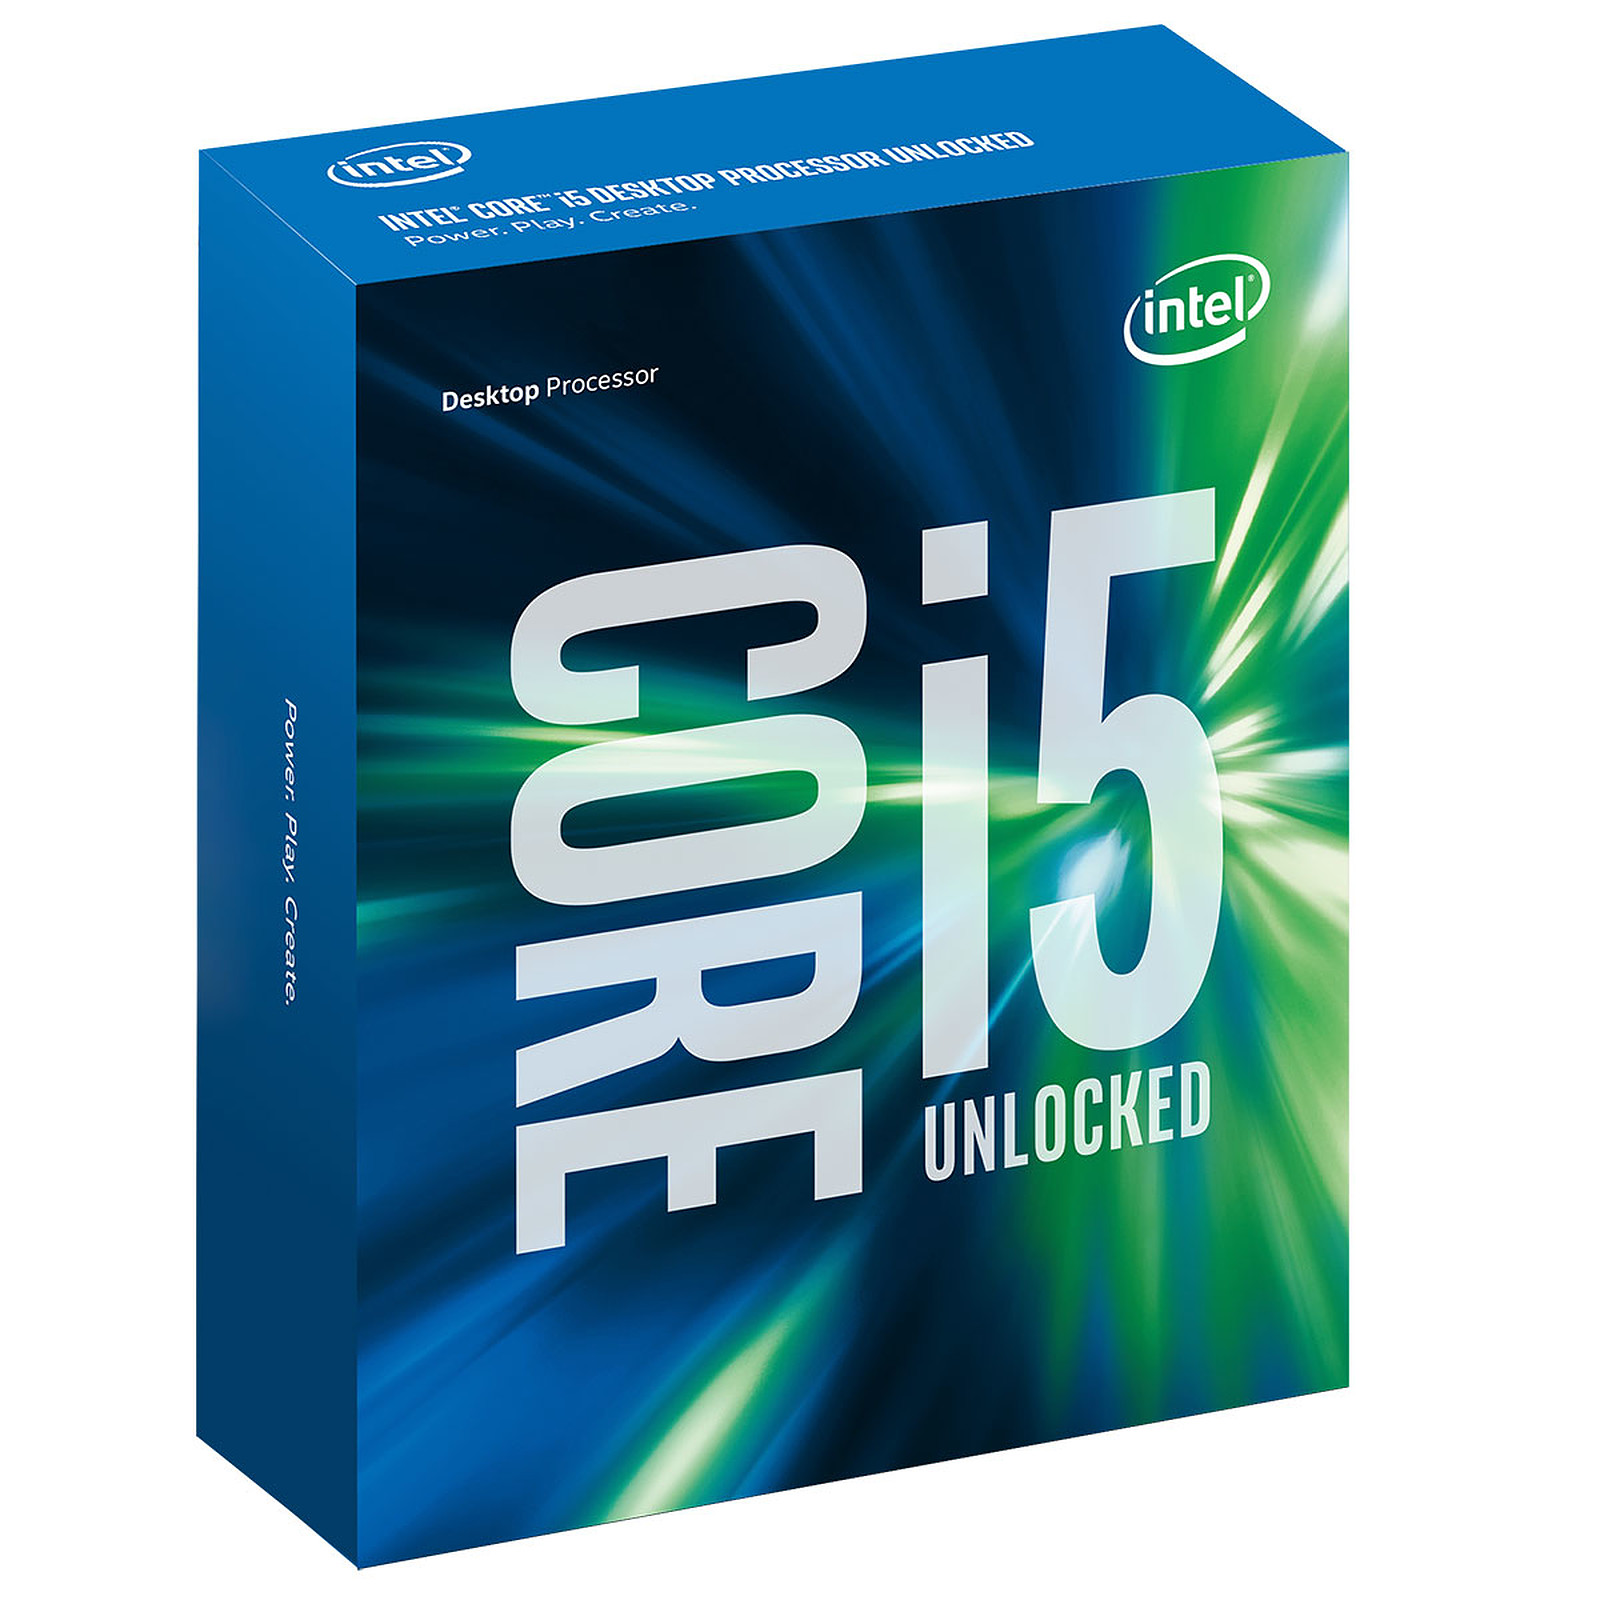 Intel Core i5-6600K (3.5 GHz)